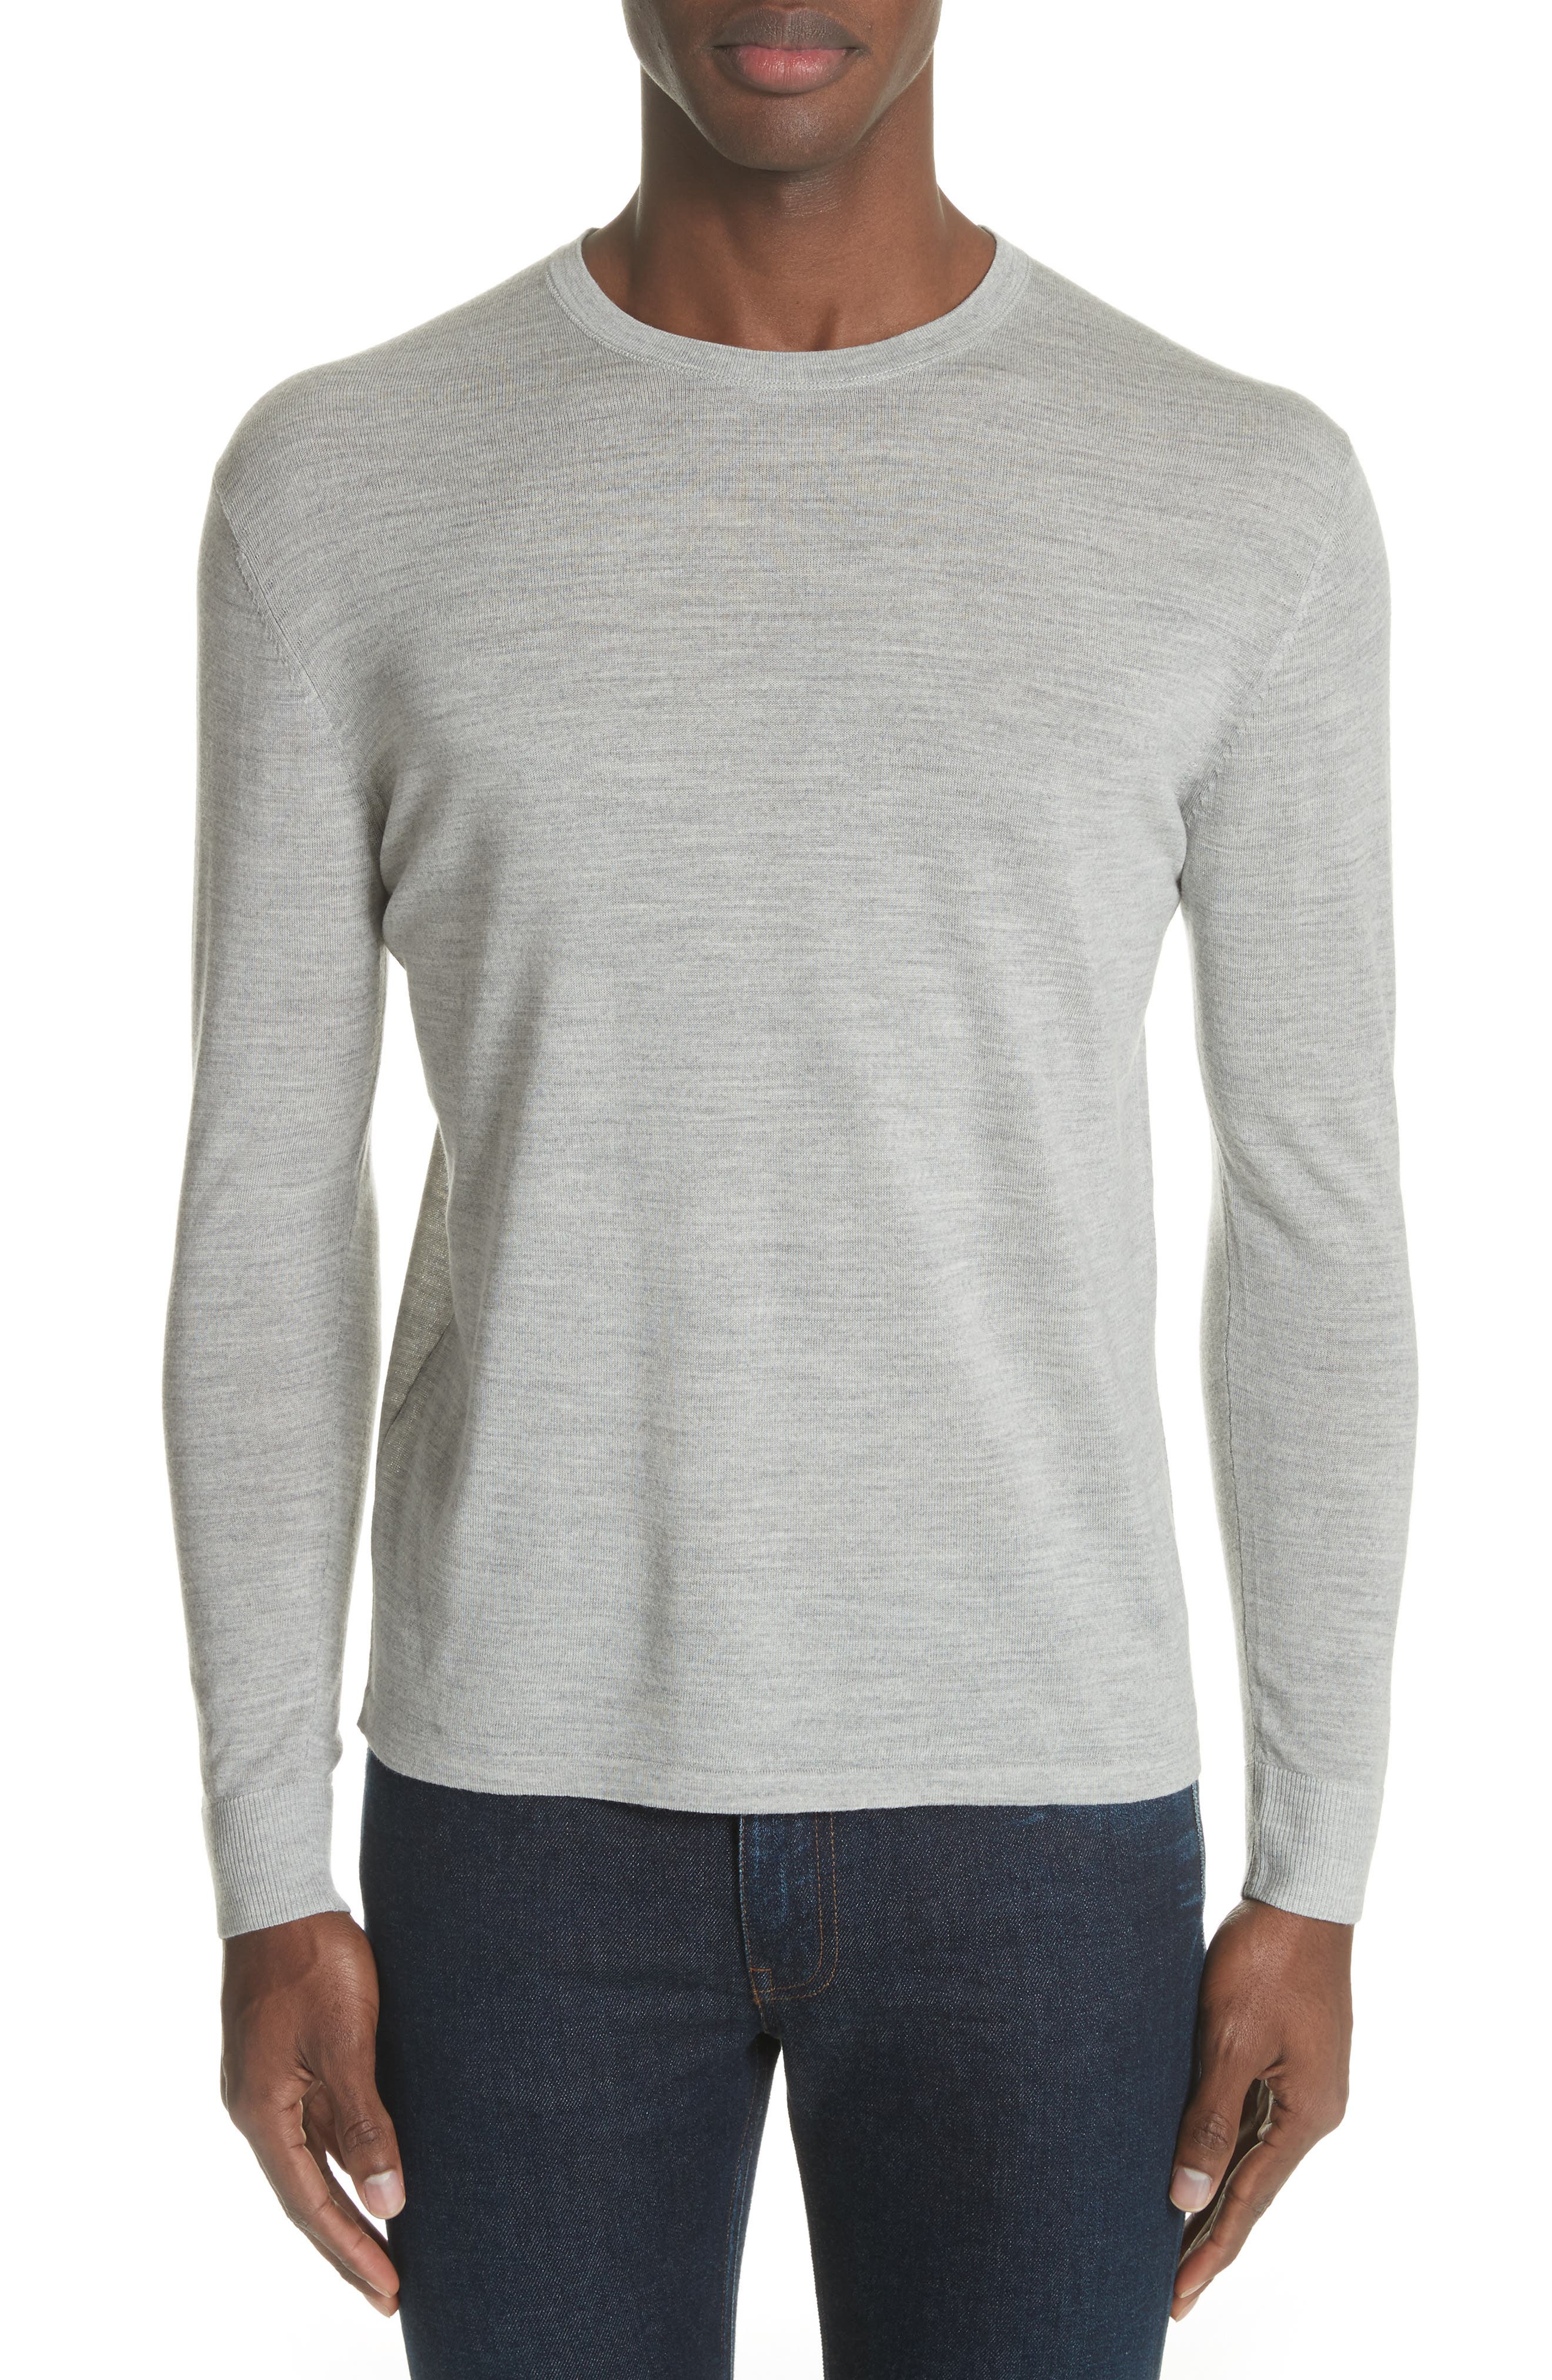 Acne Studios Nino Crewneck Wool Sweater